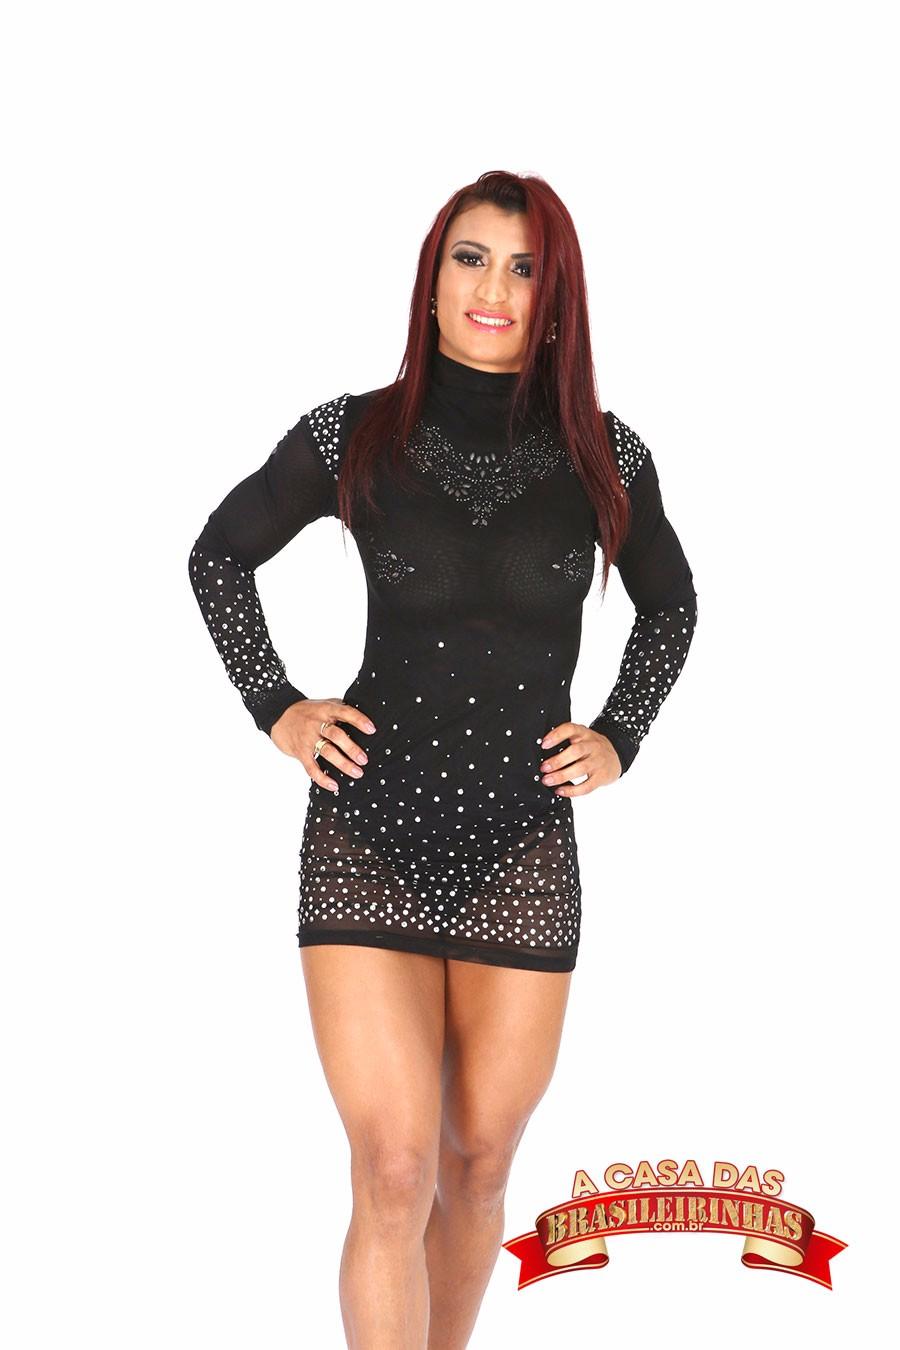 Yara-Morganna-com-vestido-preto.jpg